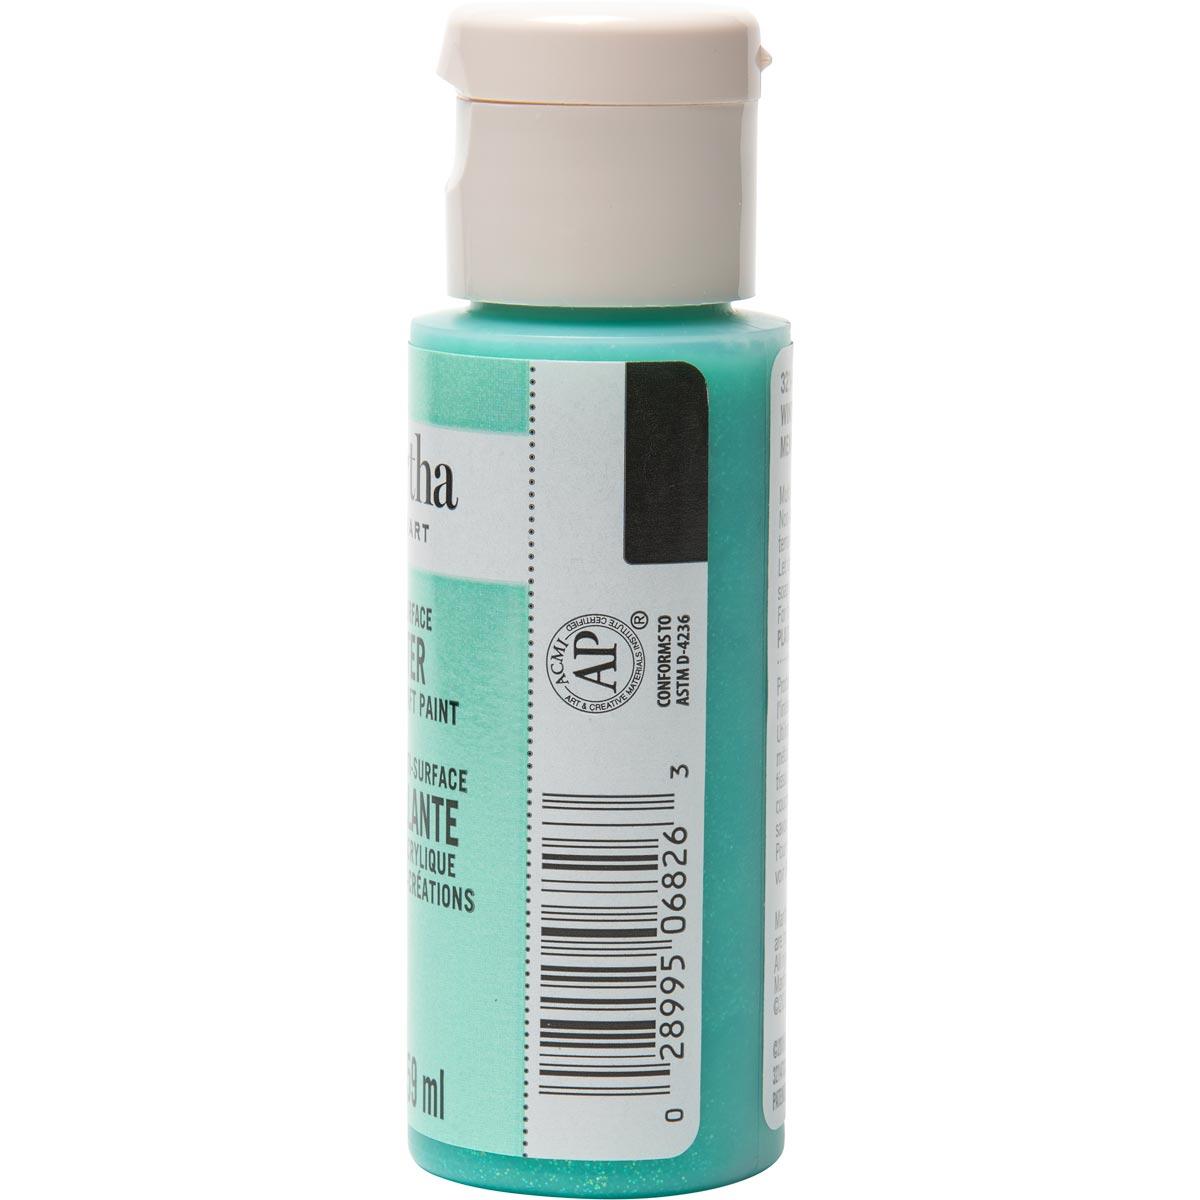 Martha Stewart ® Multi-Surface Glitter Acrylic Craft Paint - Wintermint, 2 oz. - 32147CA